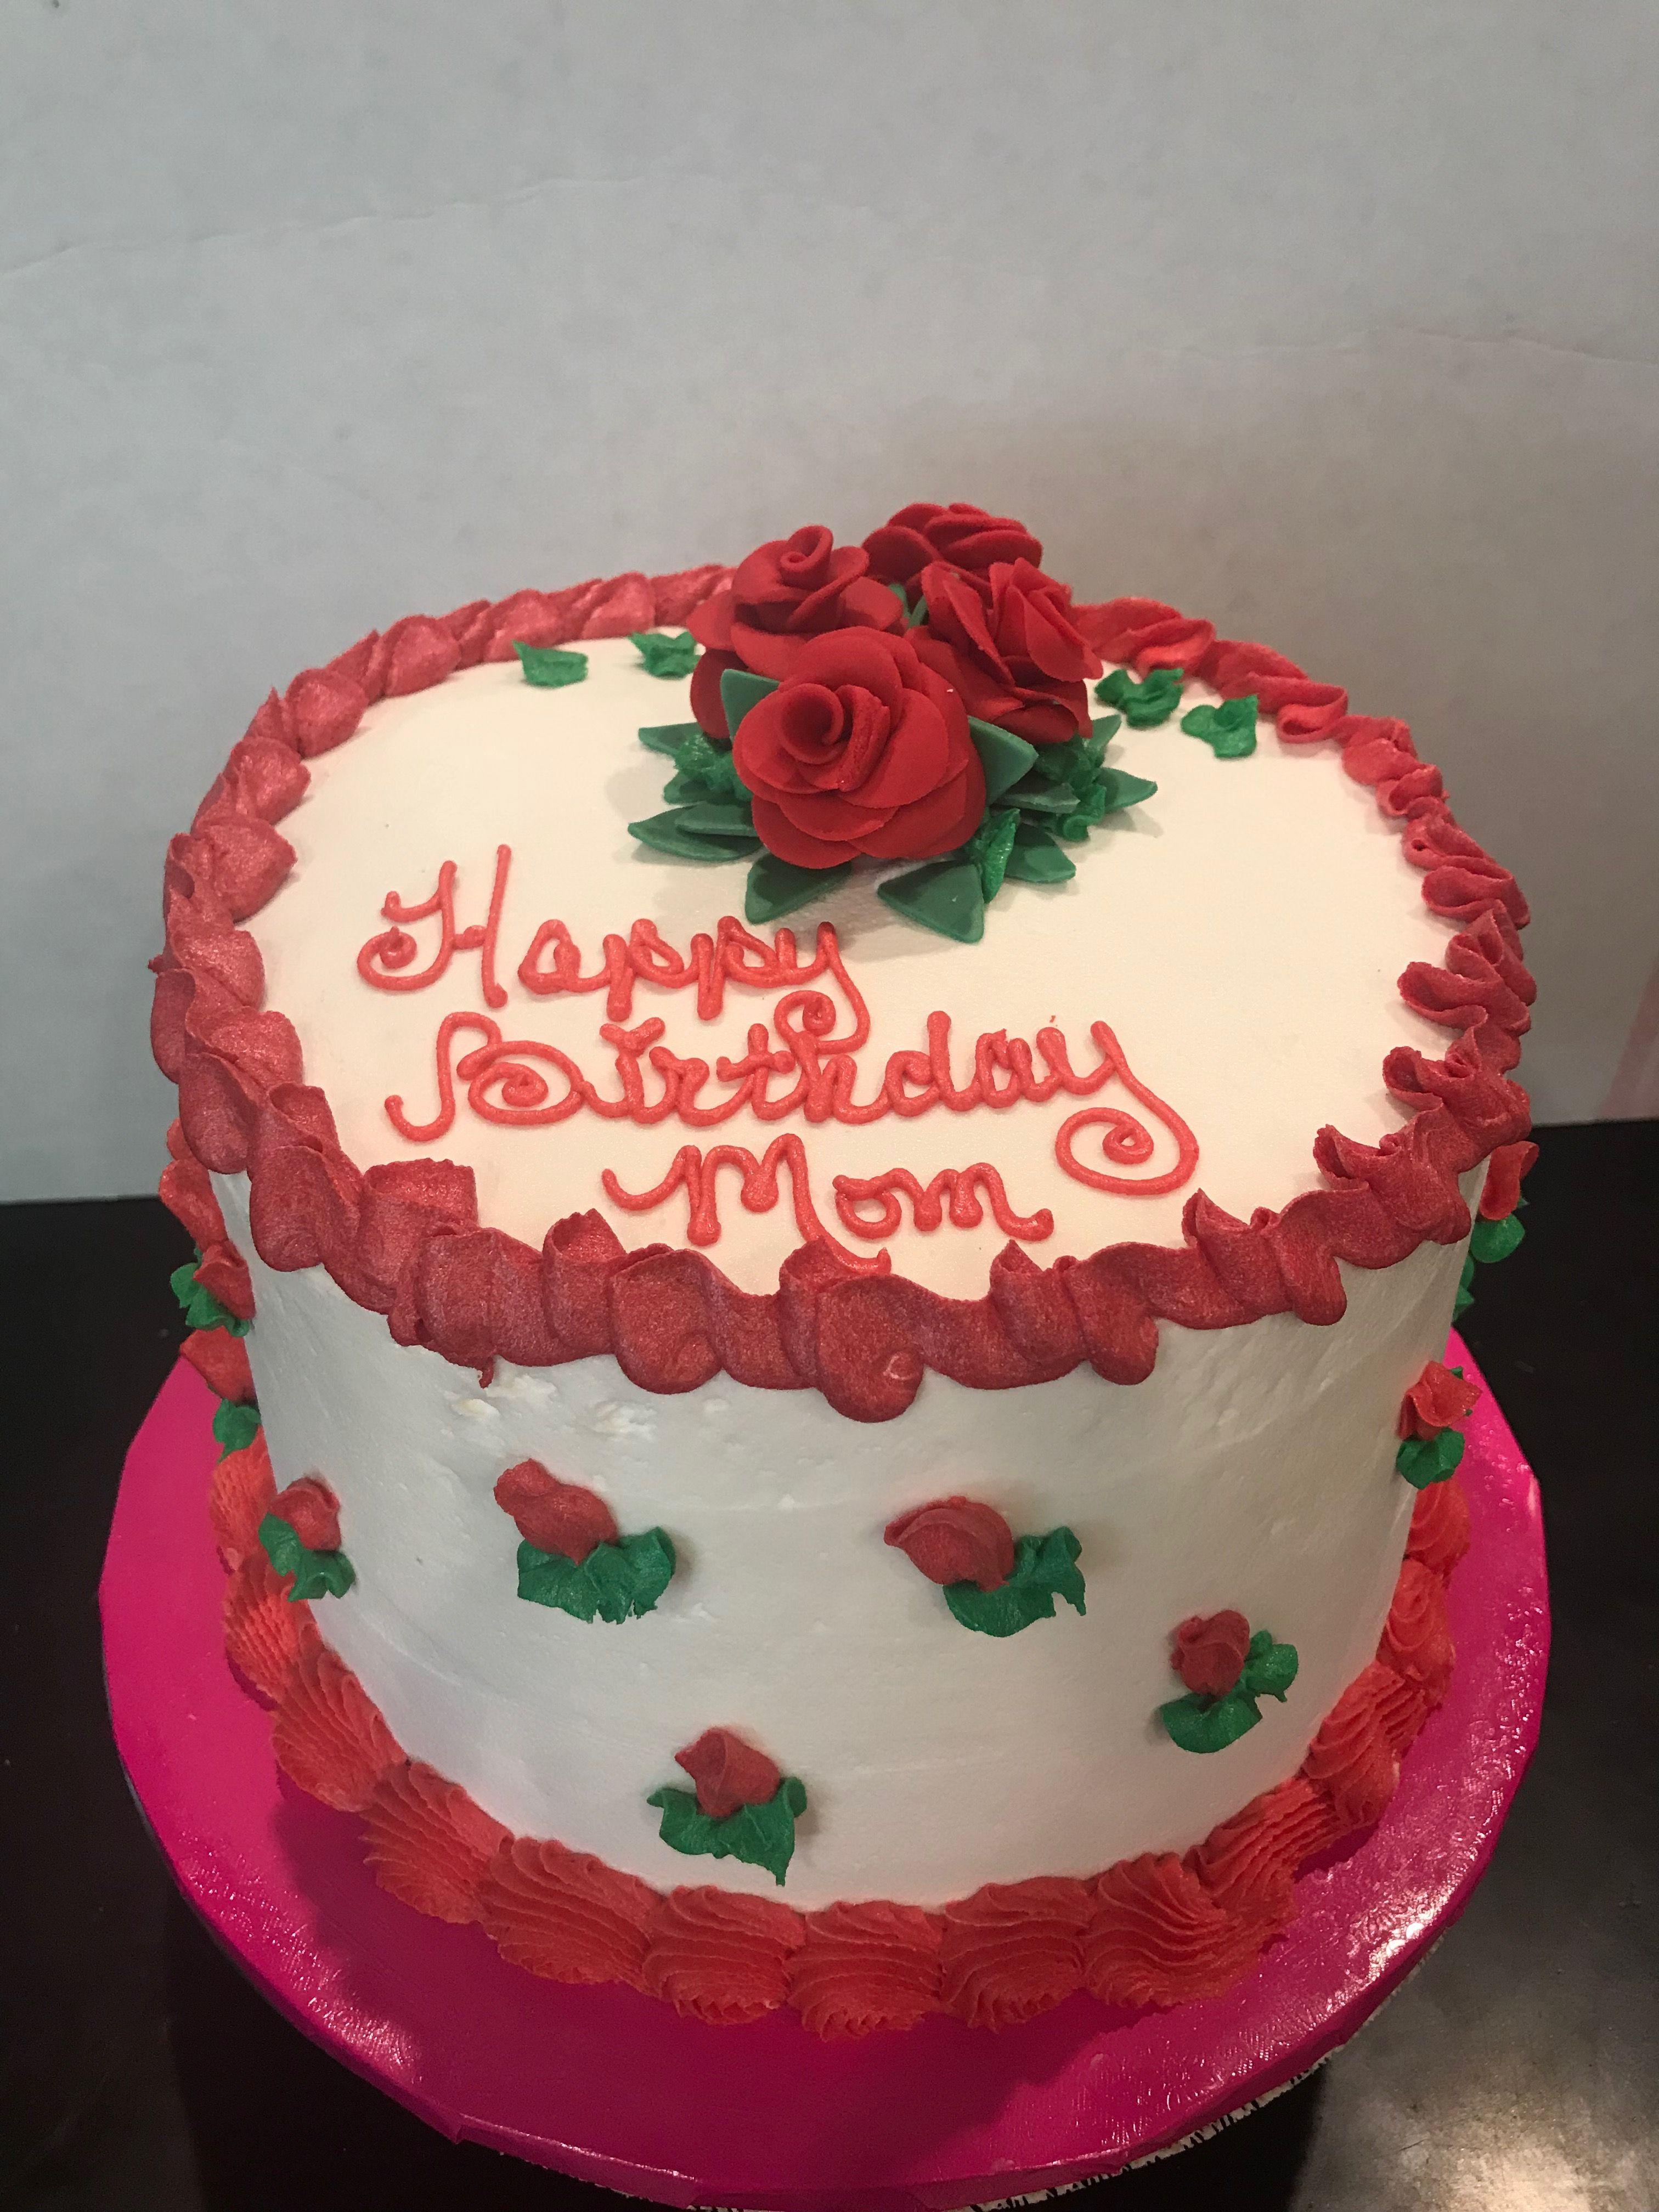 June 24 2018 Red Roses Ice Cream Cake Happy Birthday Mom